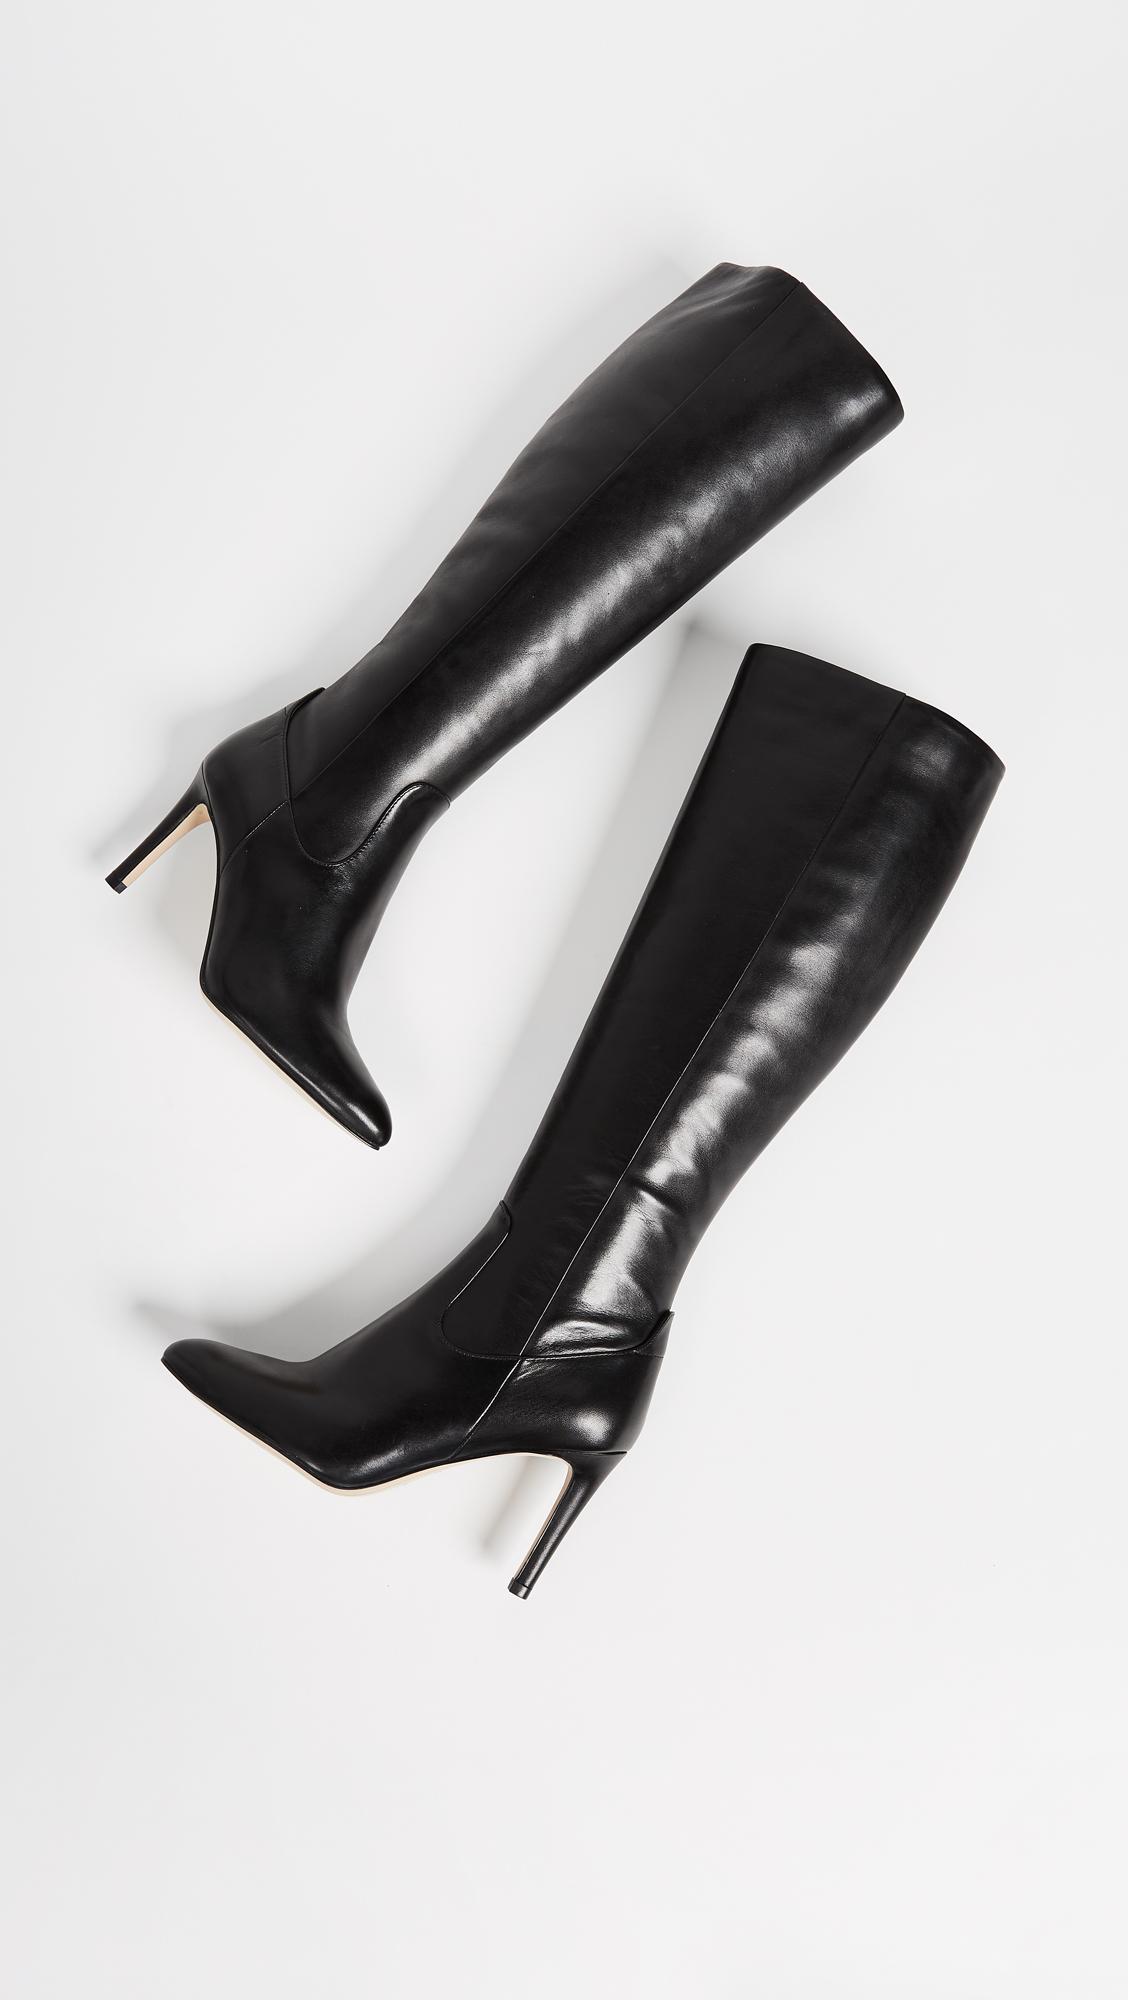 cc2874164e0 Sam Edelman Olencia Tall Boots